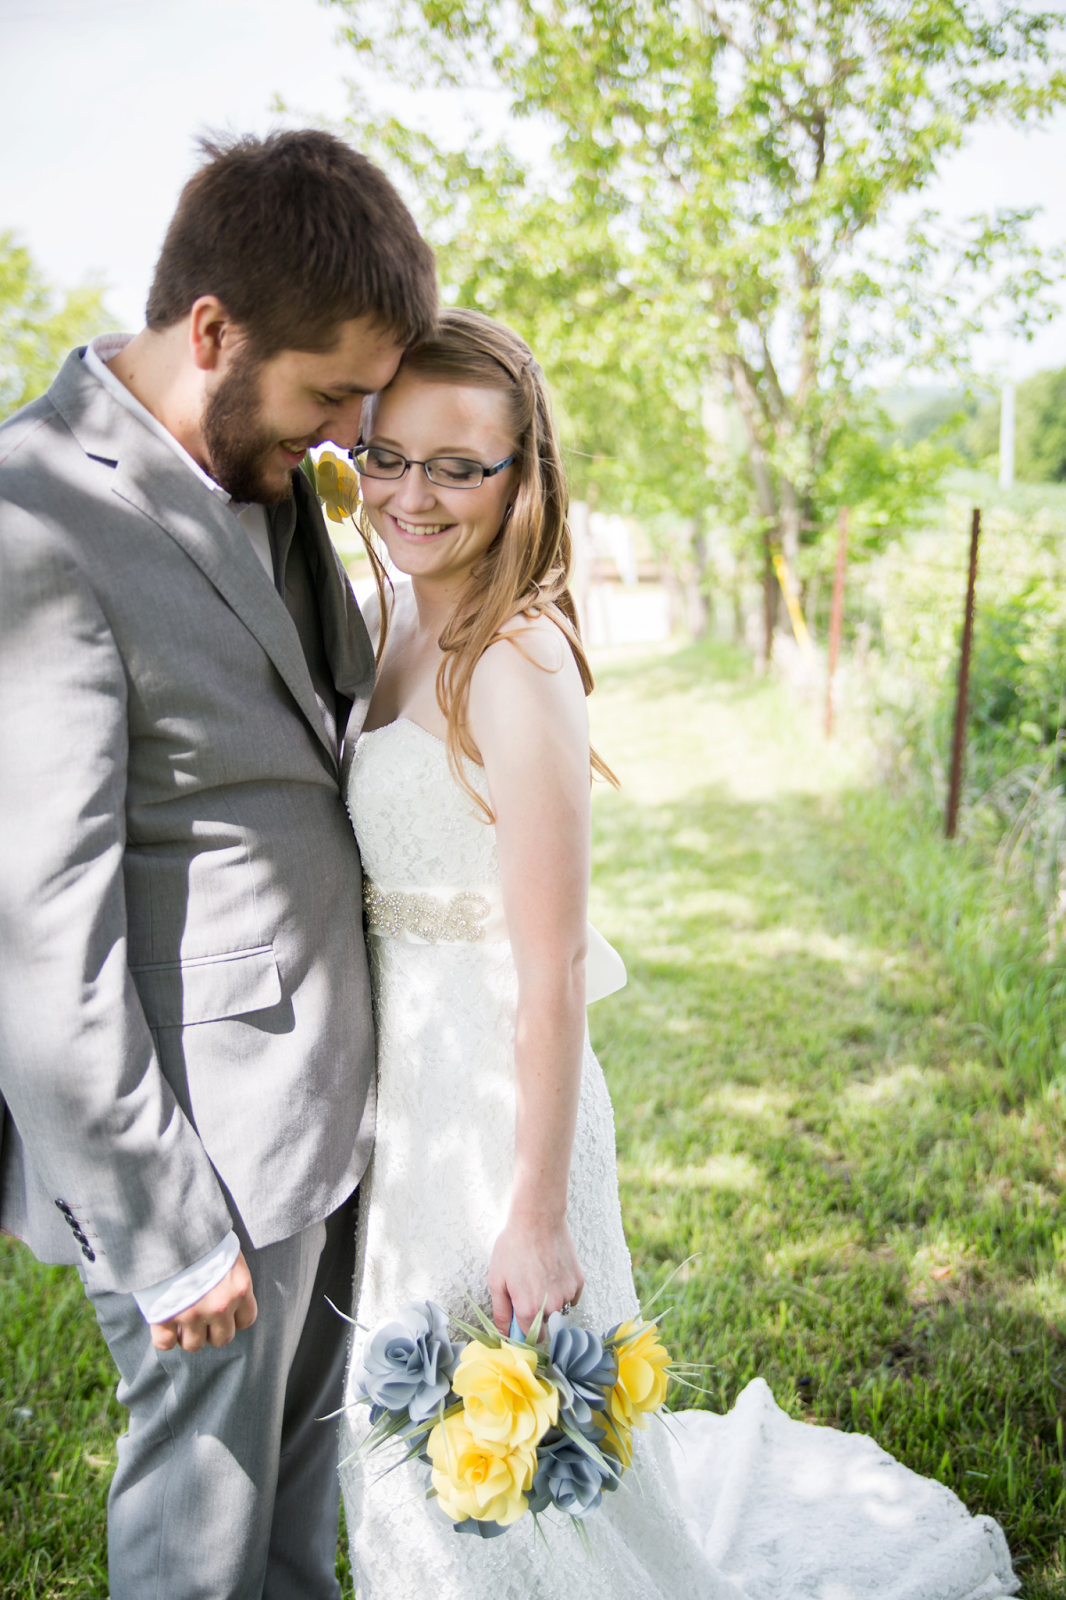 Wedding And Bridal Photography Pose Ideas Kansas City Photographer Country Wedding Cute Bridal Photography Poses Bridal Photography Wedding Photography